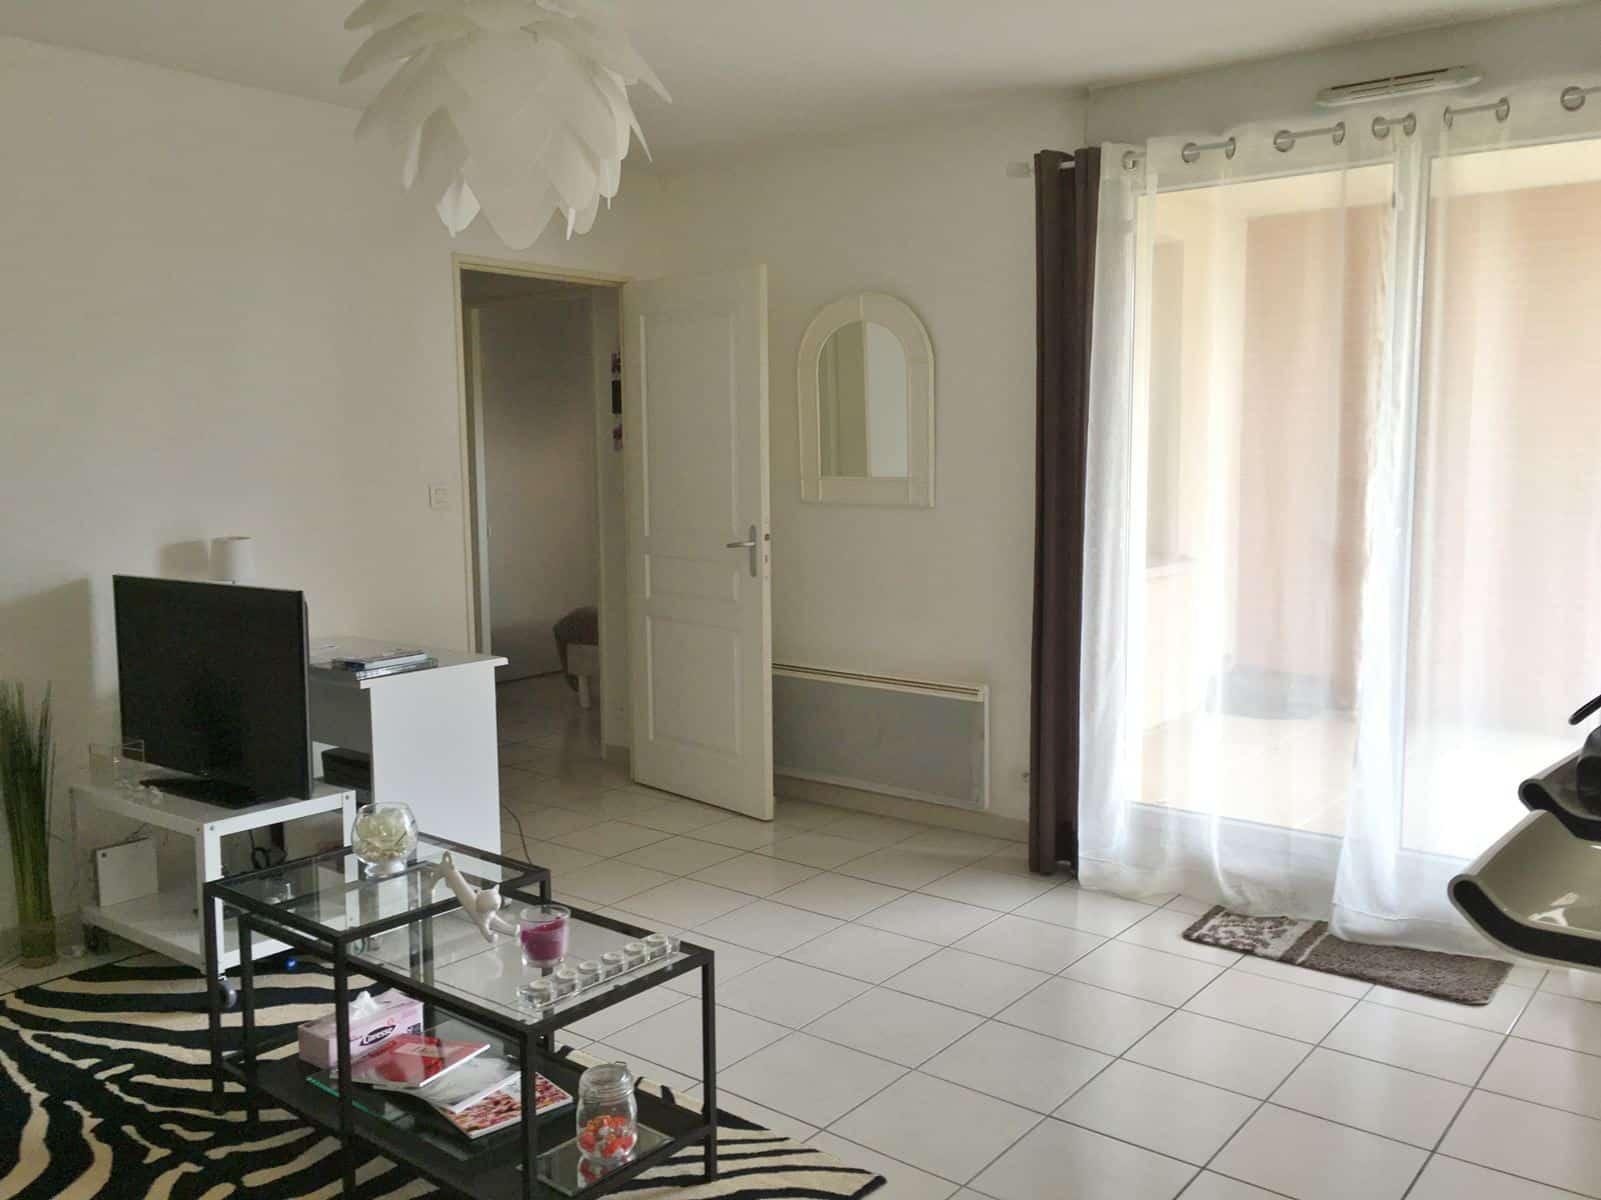 Location appartement Toulouse : conserver ses exigences